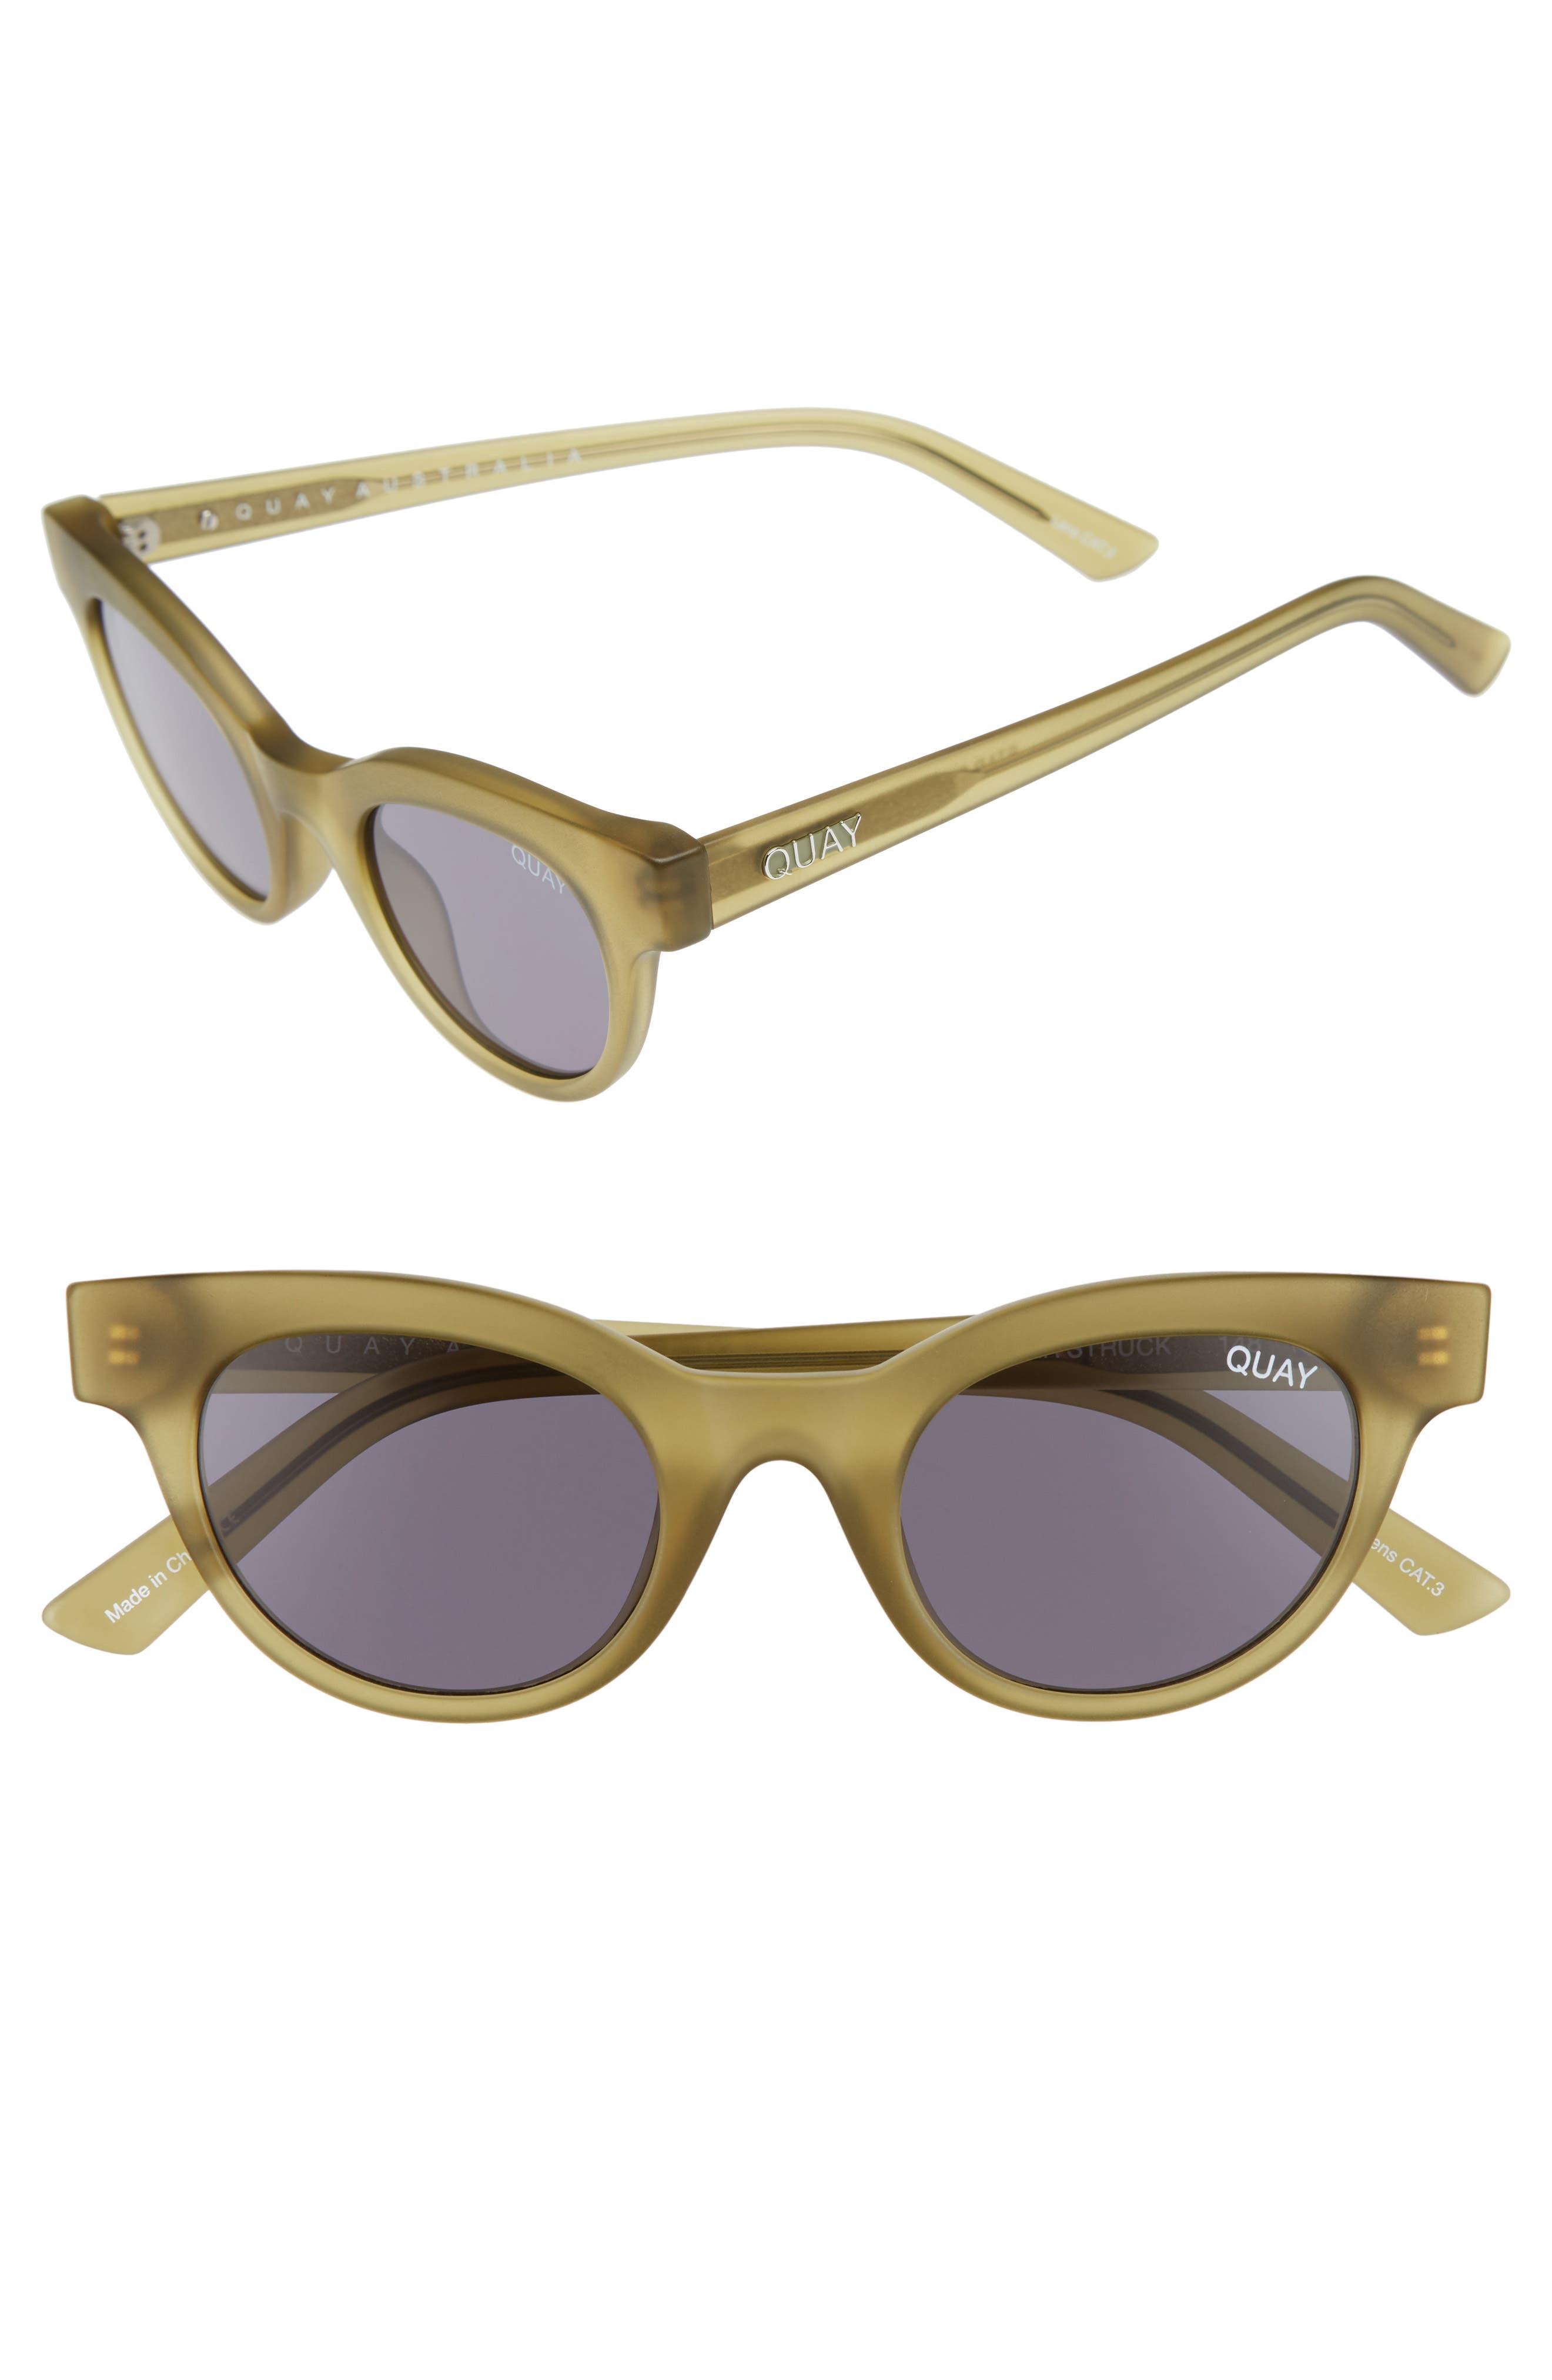 QUAY AUSTRALIA, Starstruck 48mm Cat Eye Sunglasses, Main thumbnail 1, color, 300